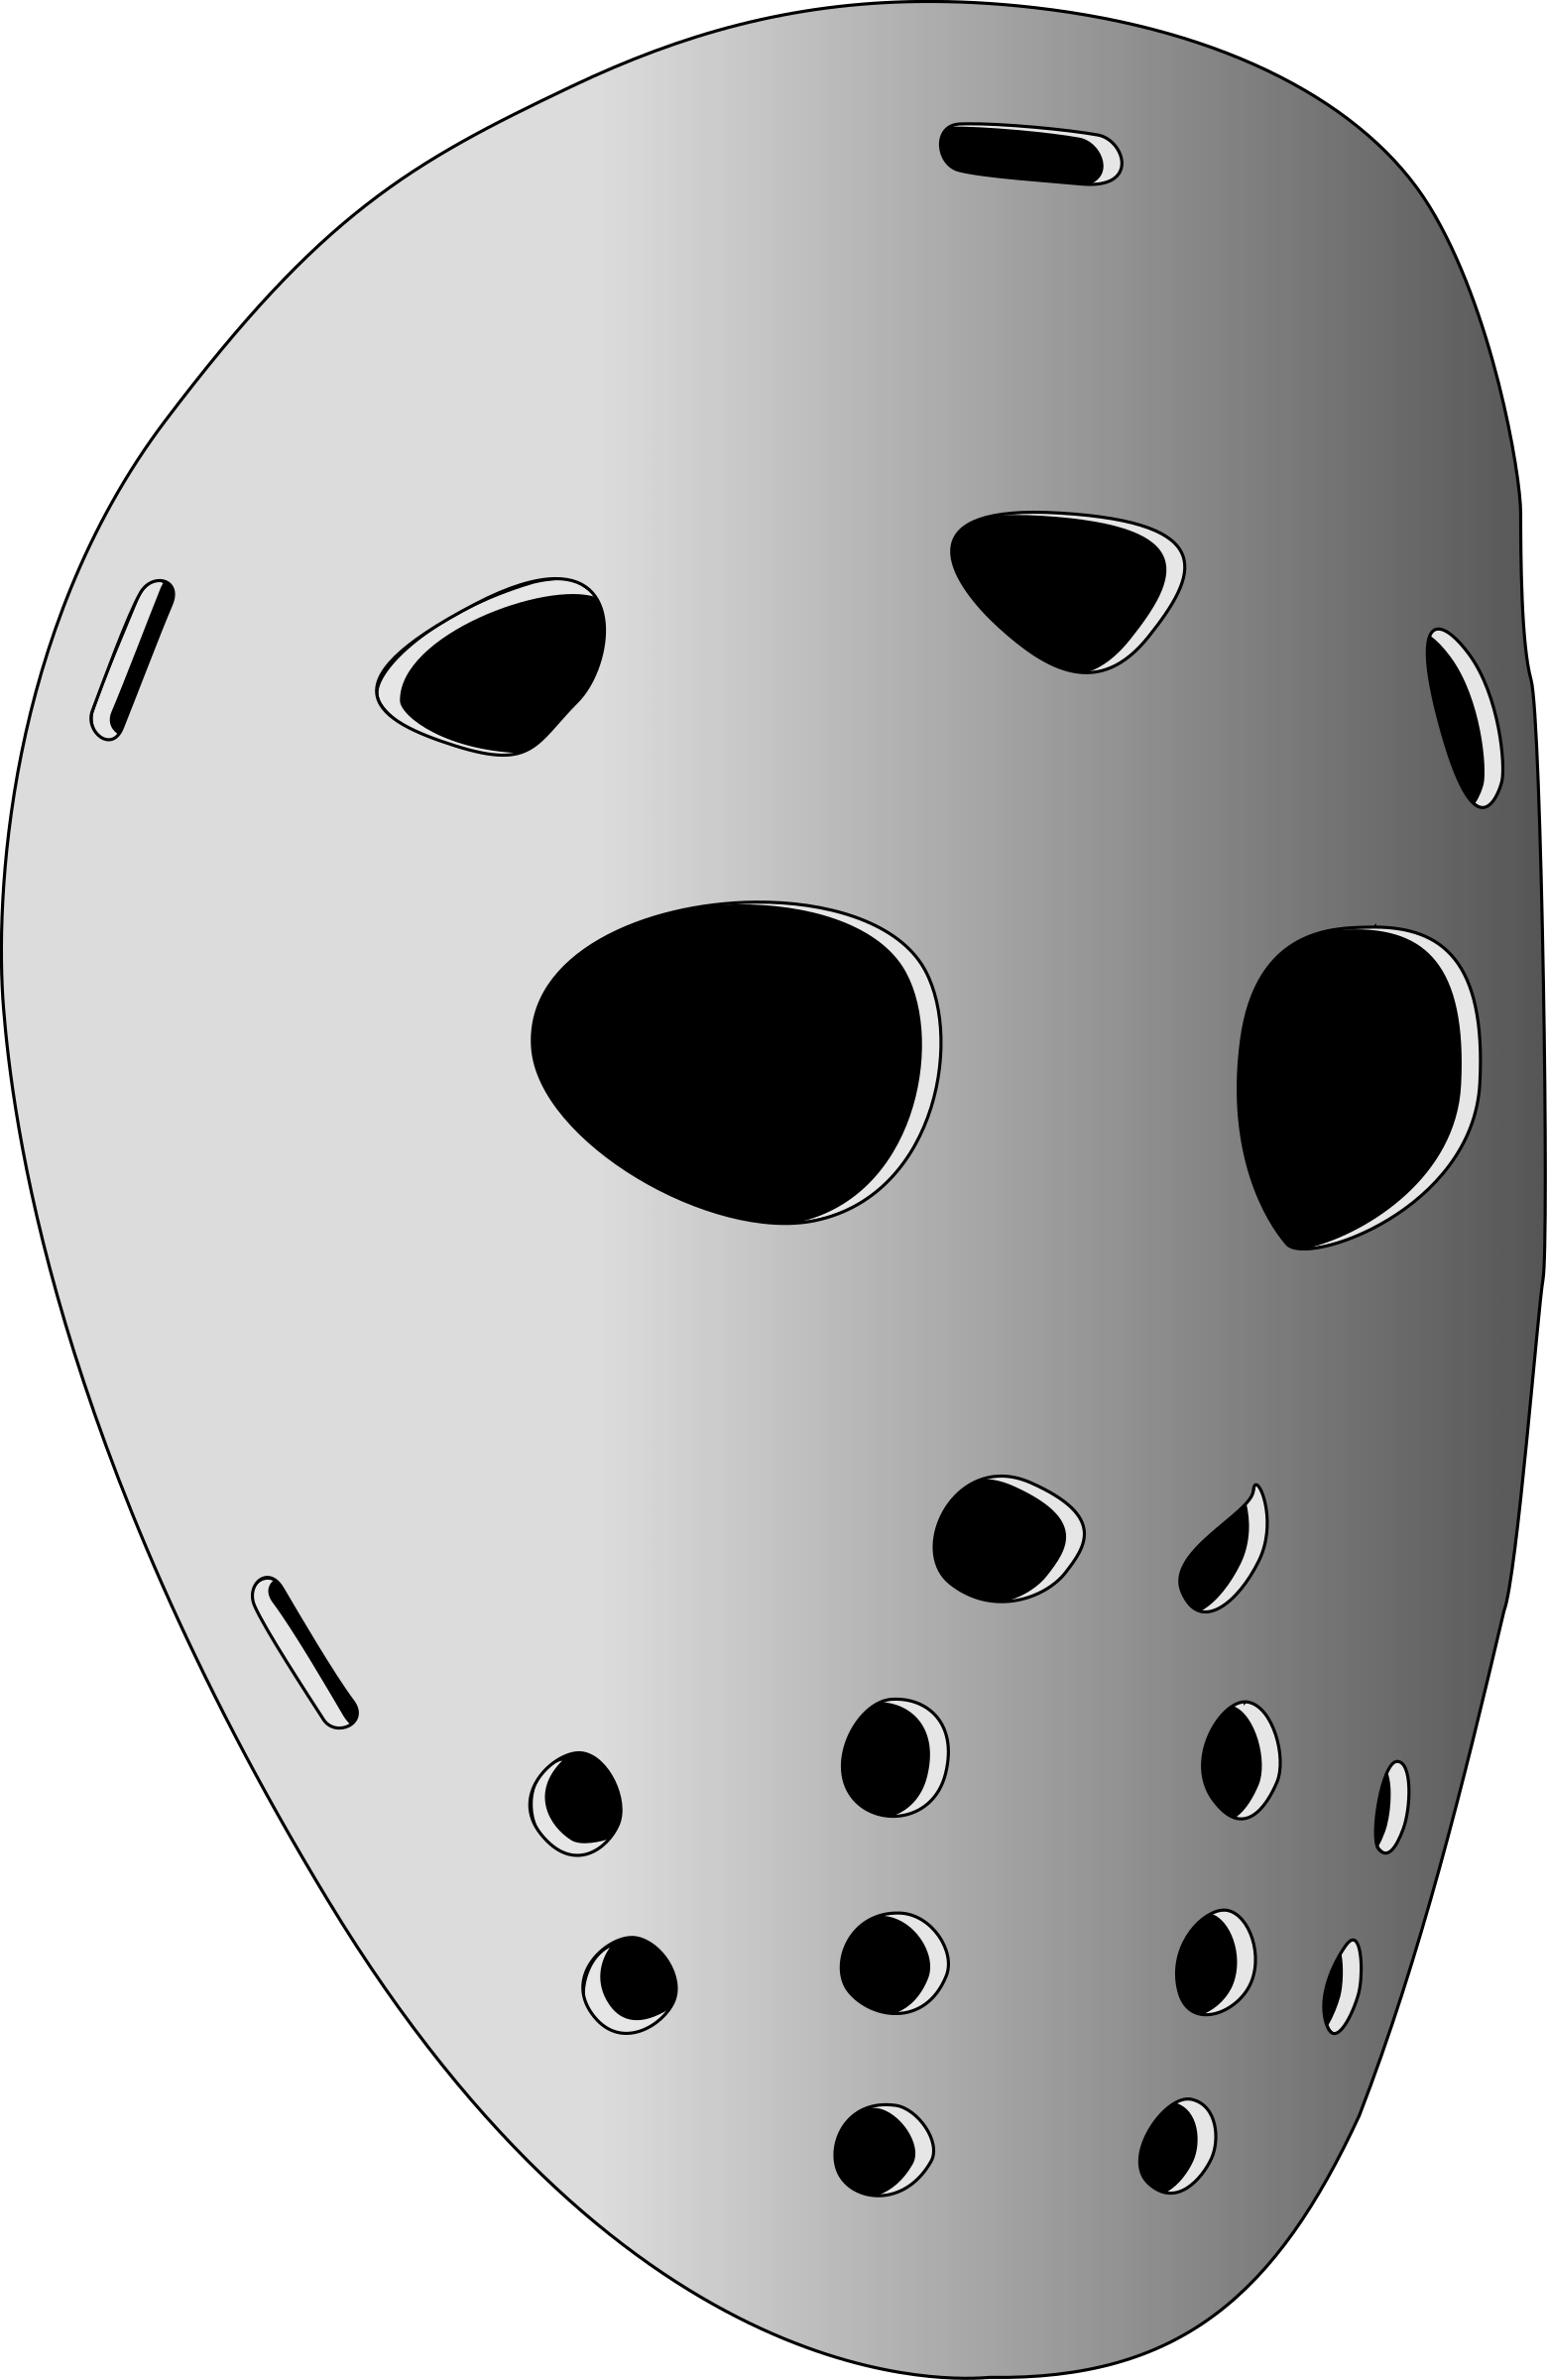 Phanom clipart hockey mask Mask hockey hockey mask Clipart